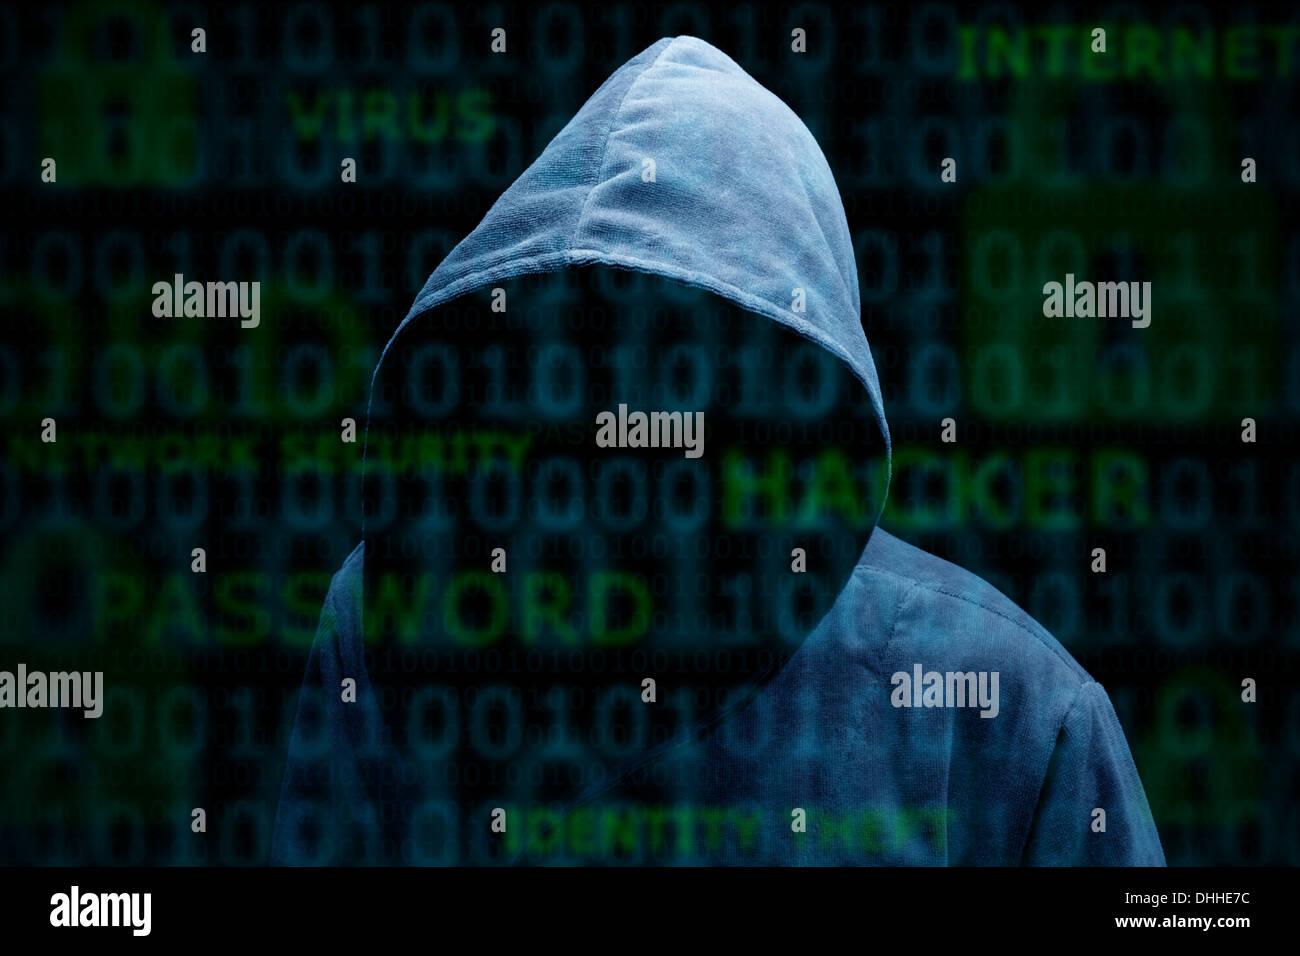 Encapuchados, silueta de un hacker Imagen De Stock